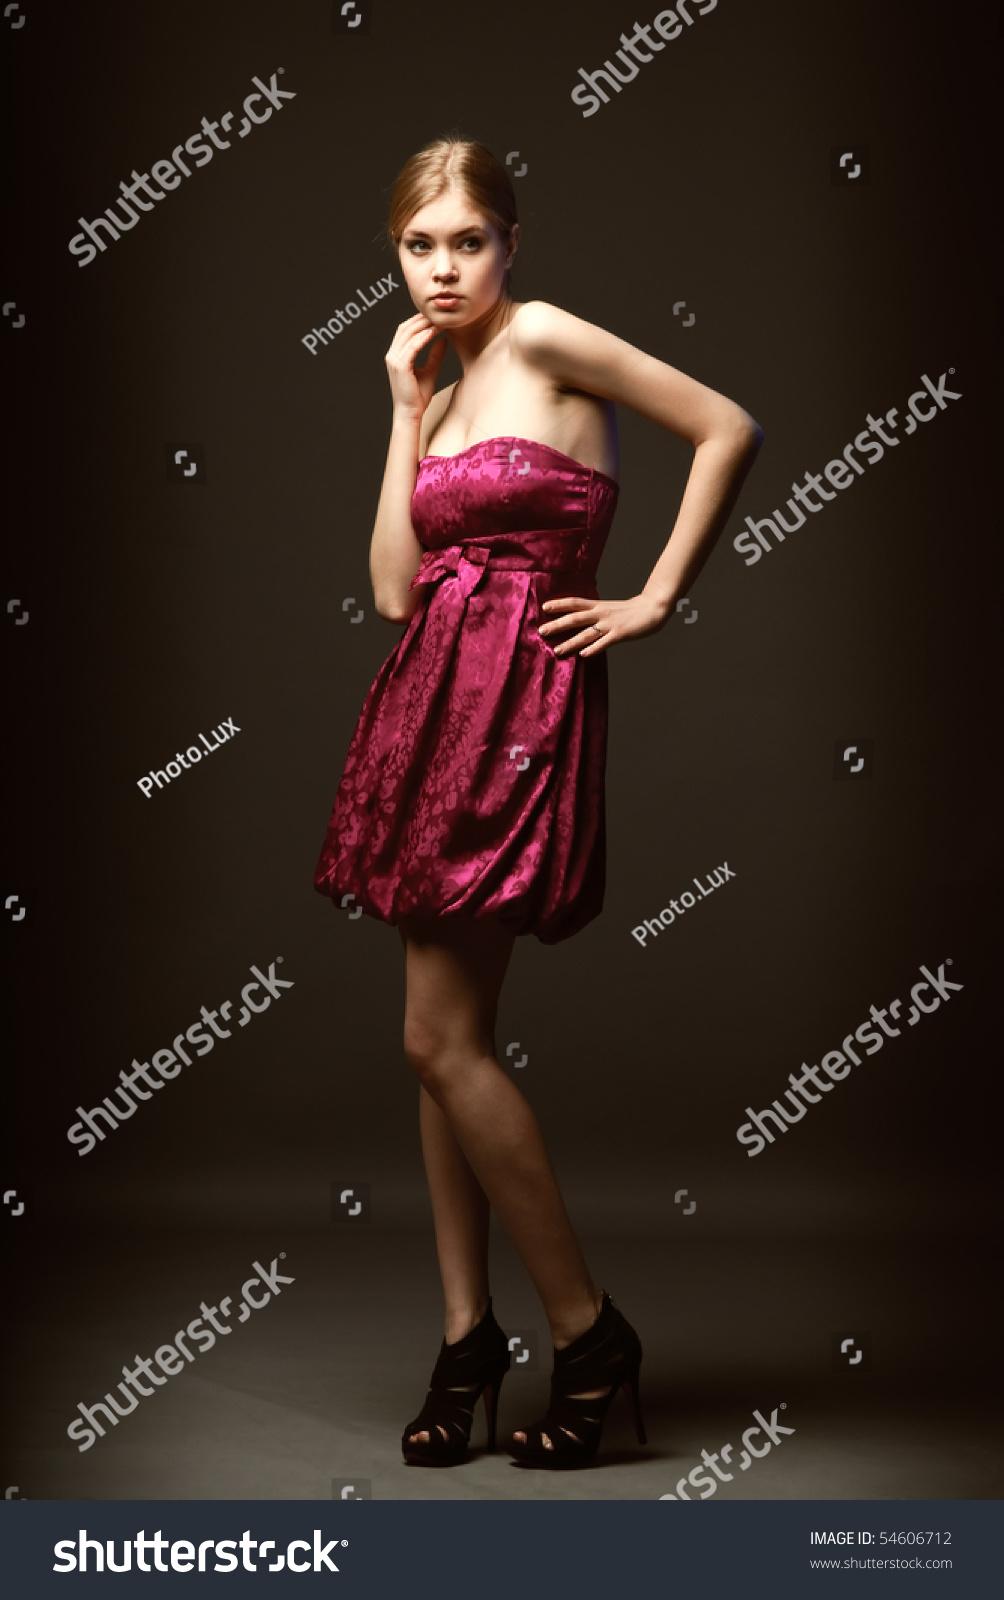 Pink Dress With Black Heels